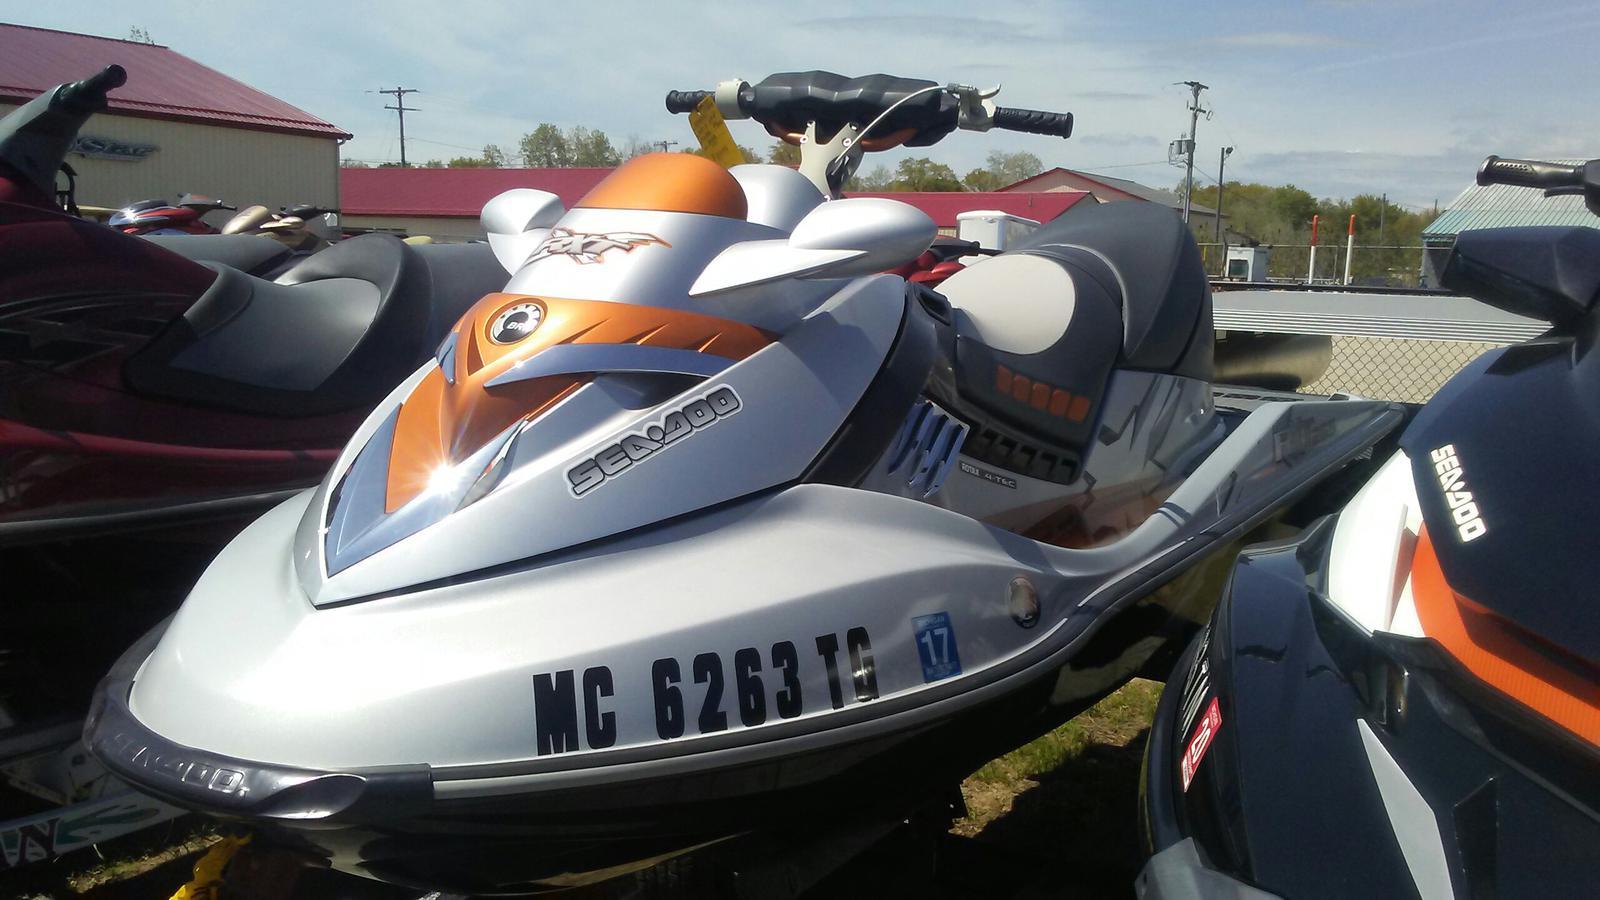 2008 Sea-Doo RXT X 255